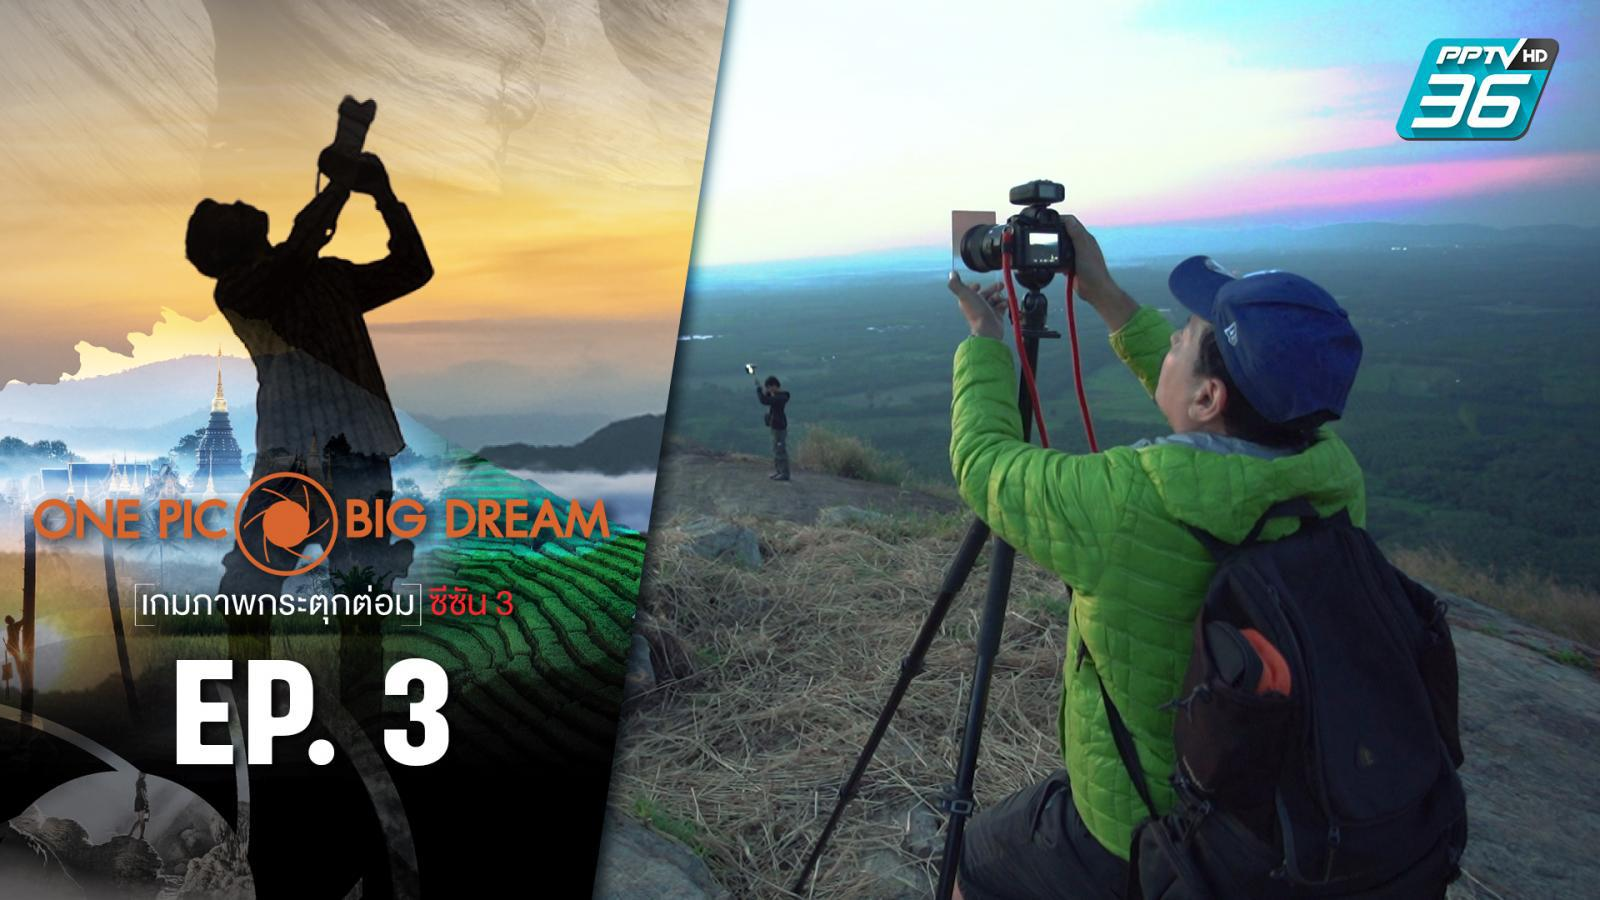 ONE PIC BIG DREAM เกมภาพกระตุกต่อม EP.3 ซีซัน 3 | 20 ม.ค. 64 | PPTV HD 36